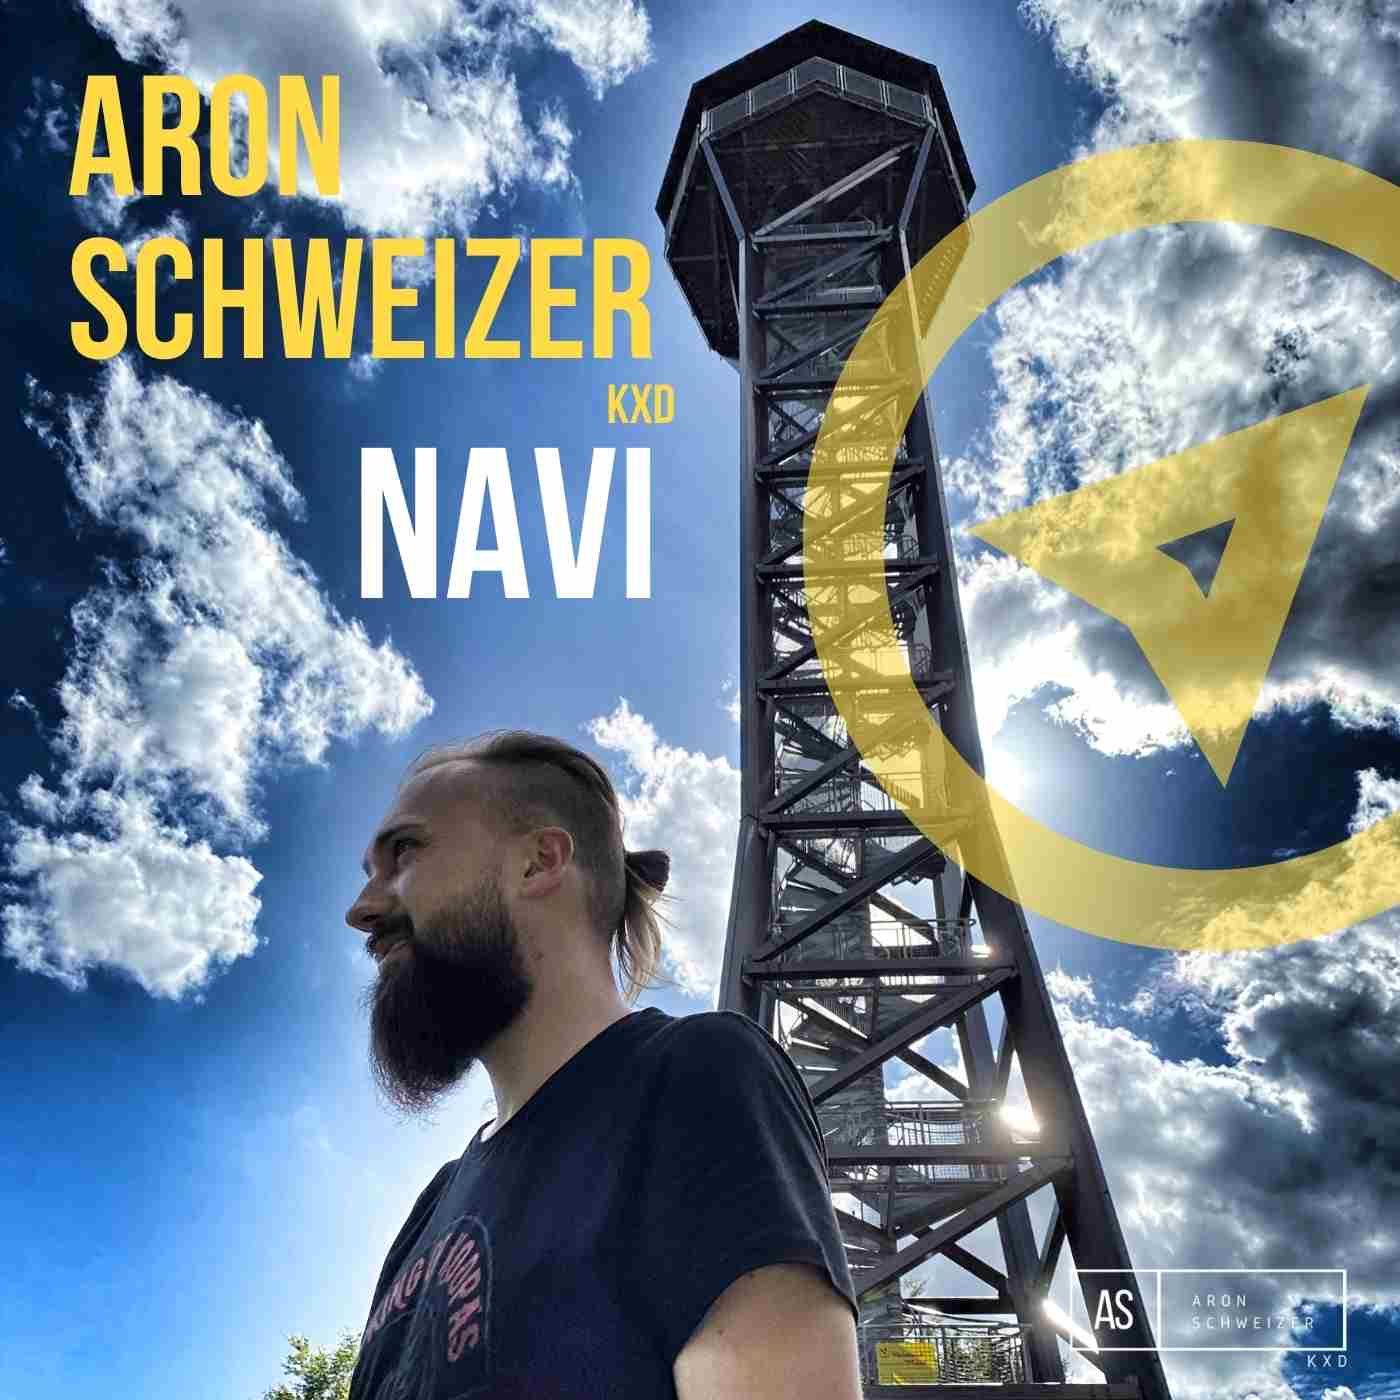 Upcoming: Aron Schweizer (KXD) - Navi